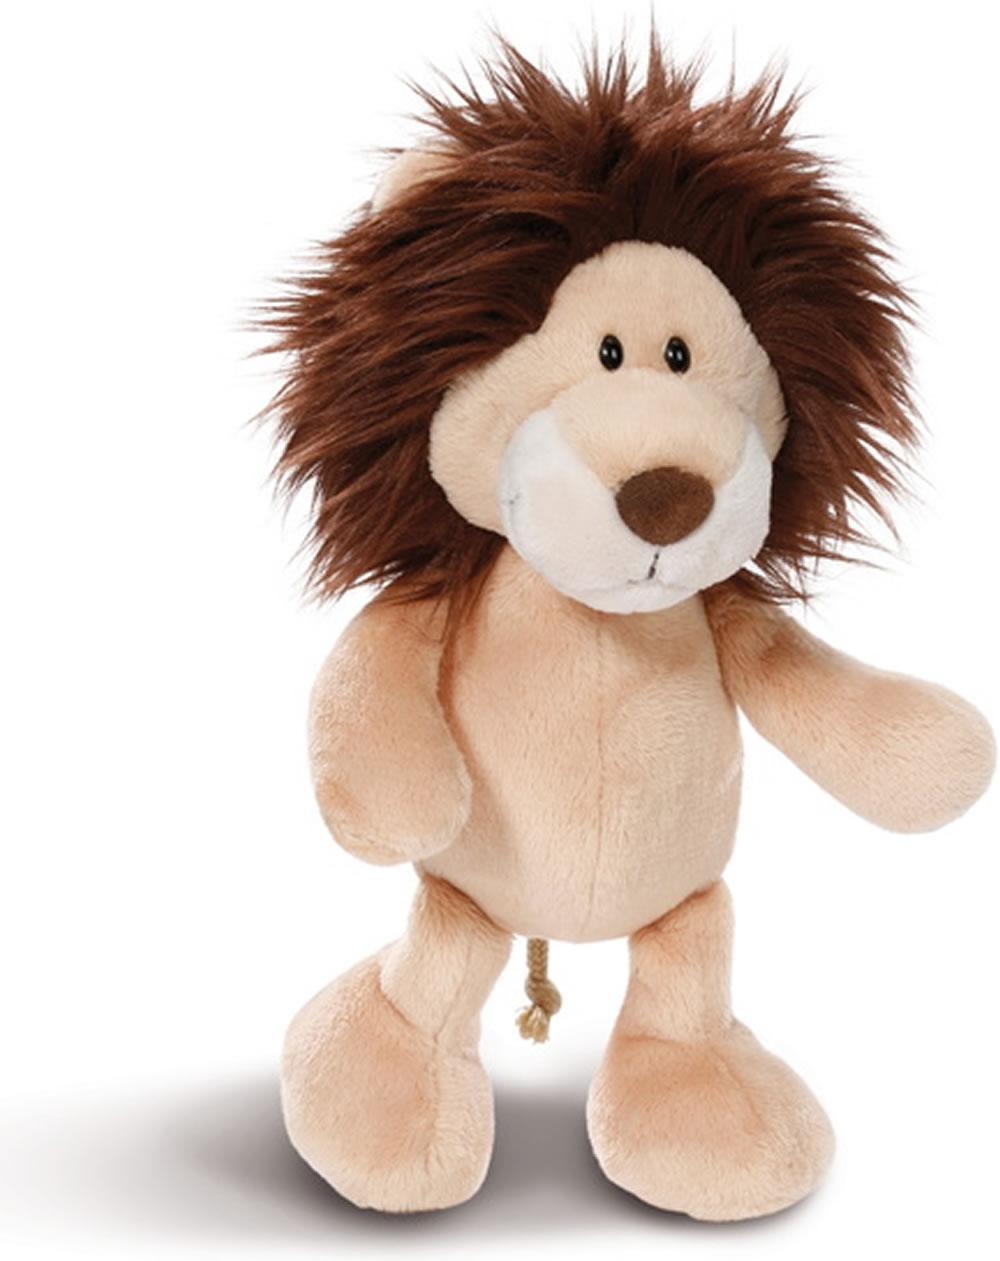 Plišana igračka ZOO FRIENDS Lion